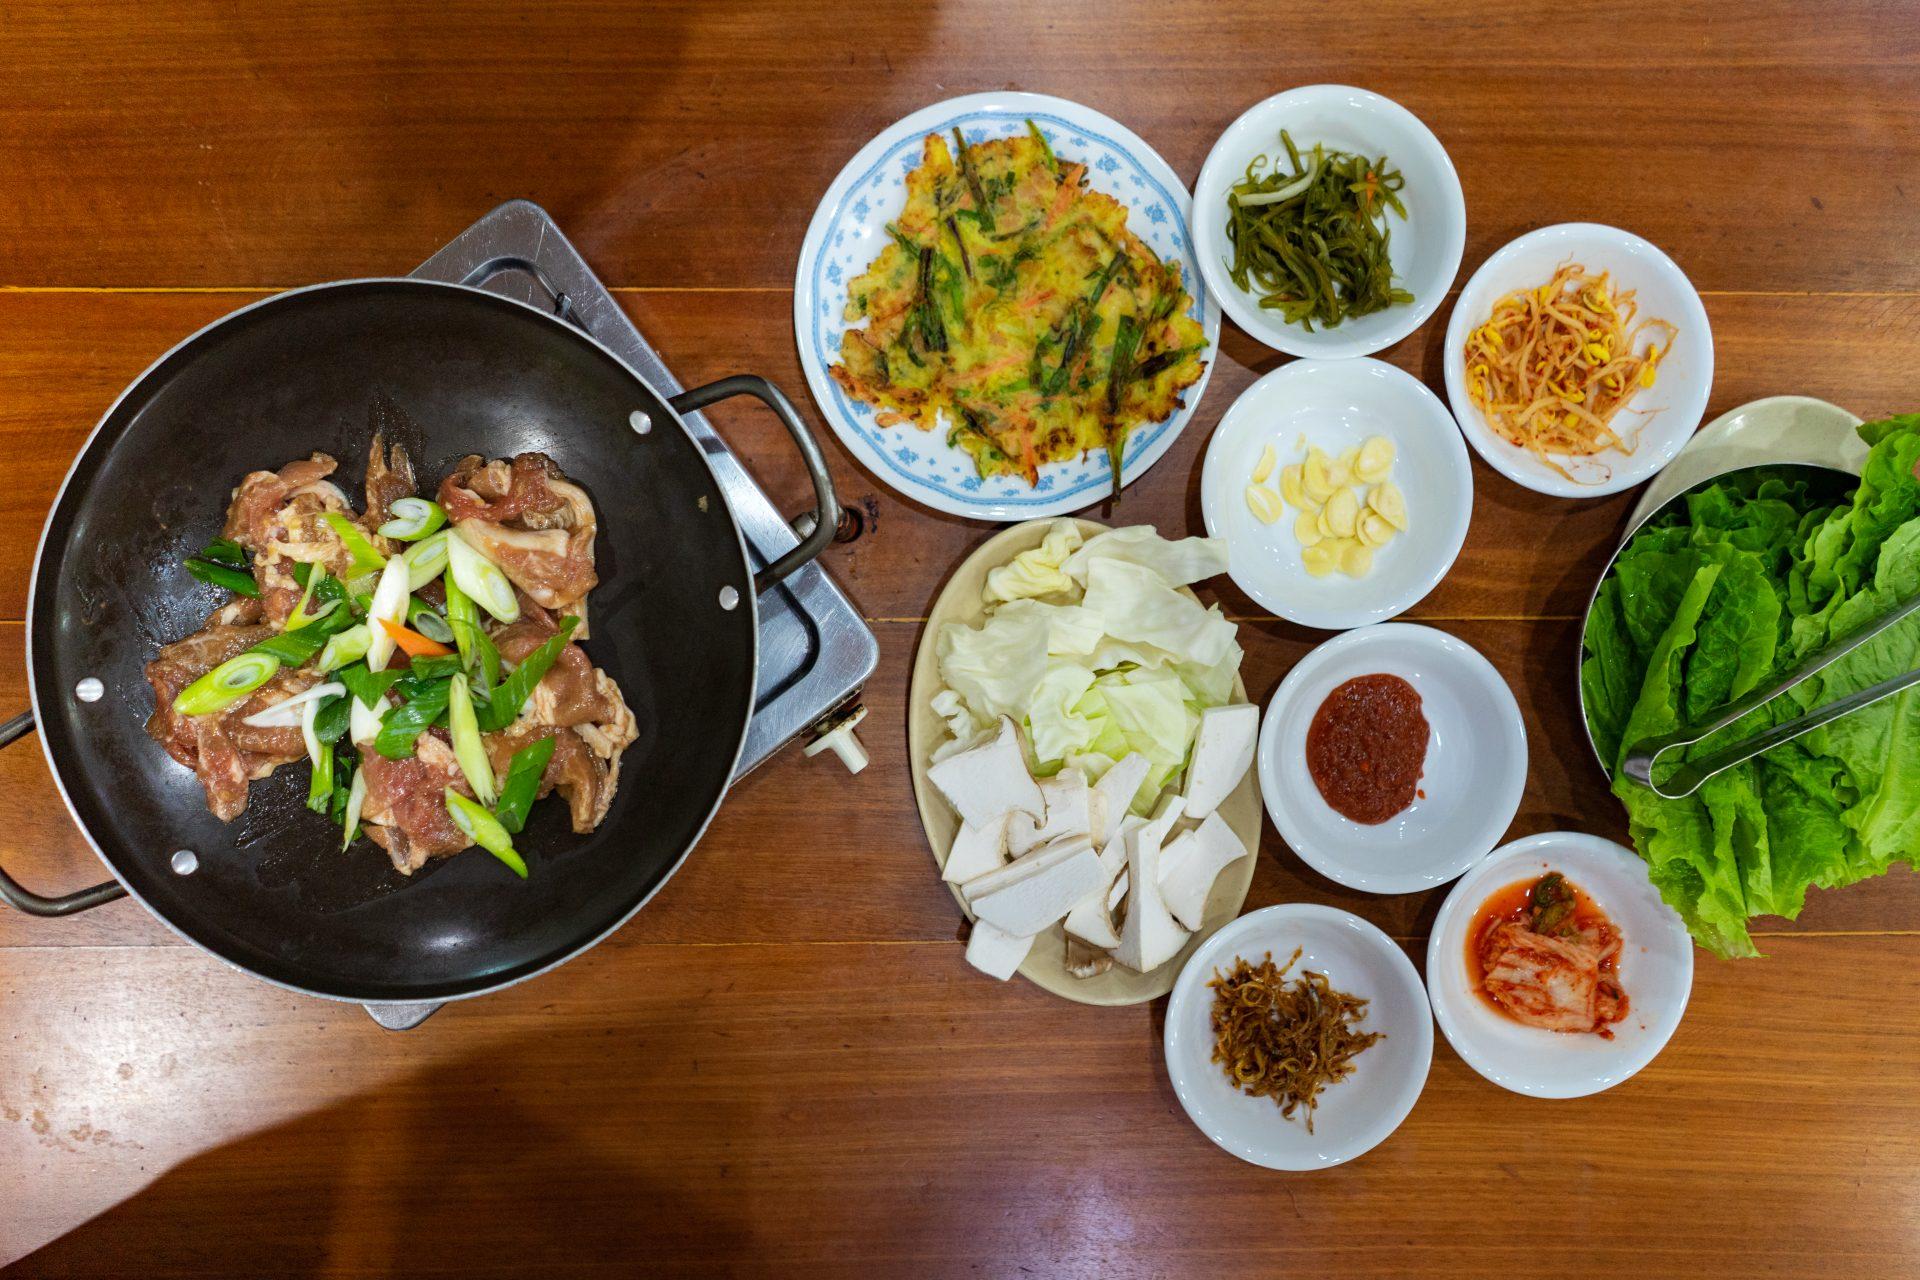 Makan Gurita Hidup-Hidup—Makanmana South Korea Trip Part I